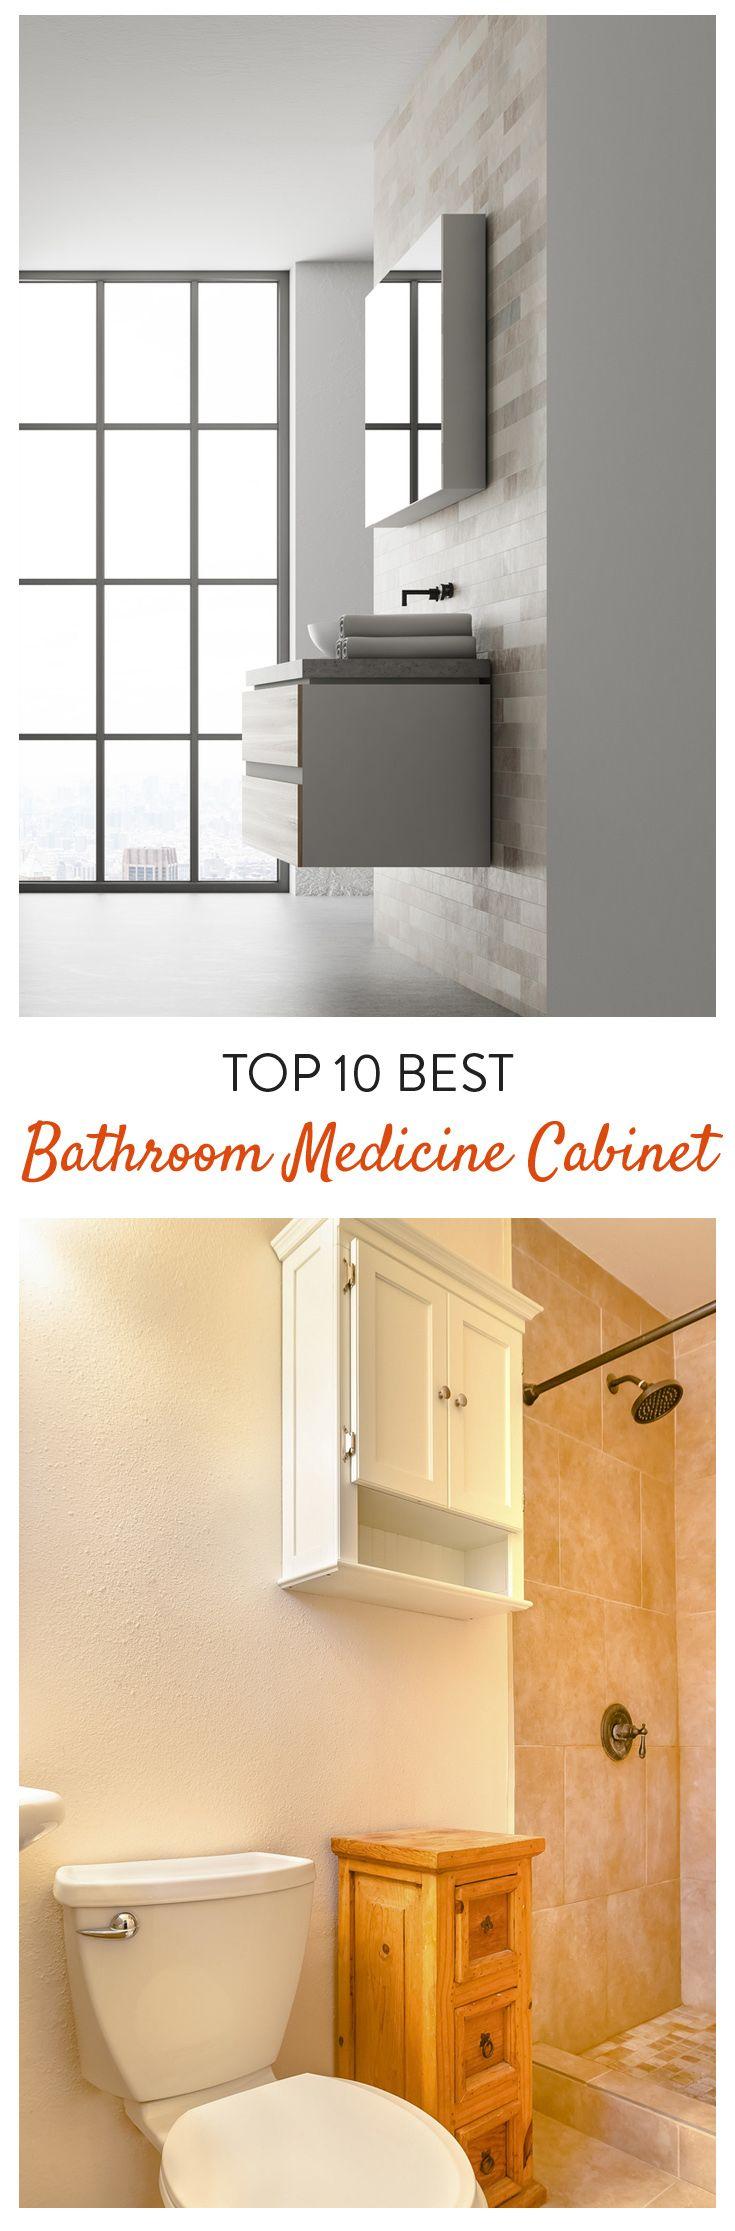 Best 25 Bathroom medicine cabinet ideas on Pinterest  Medicine cabinet mirror Medicine